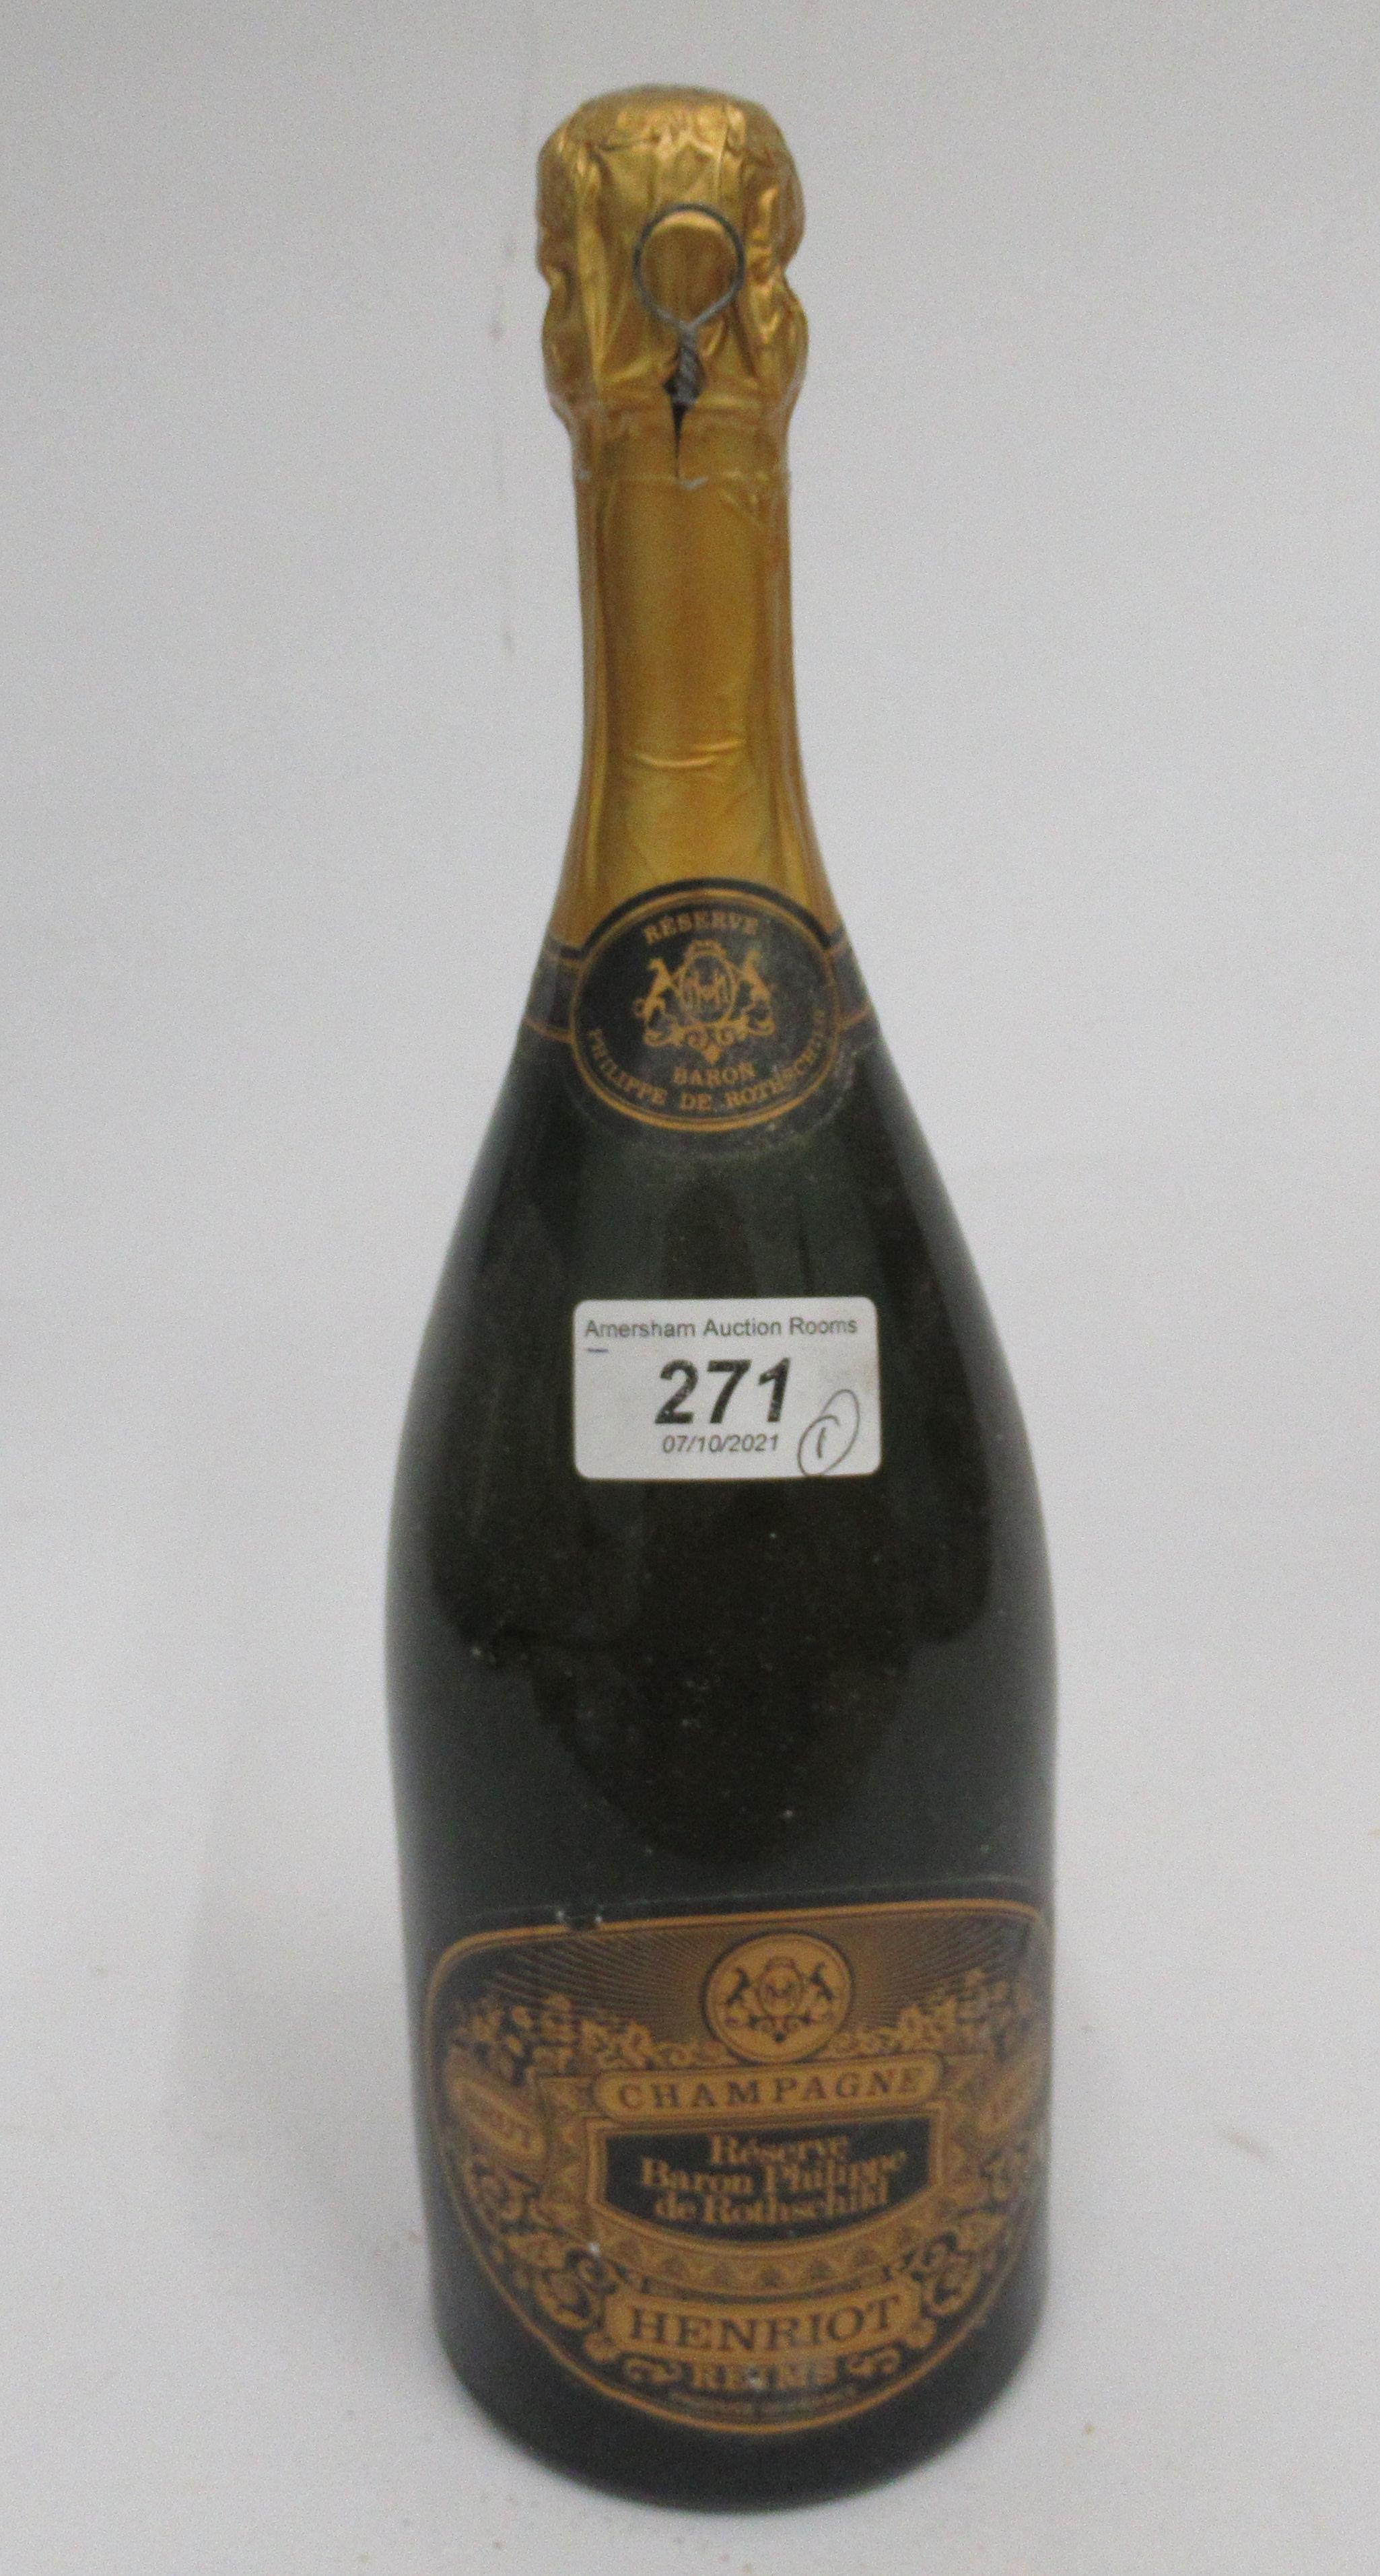 Wine, a bottle of 1973 Henriot Reserve Baron Philippe de Rothschild Champagne